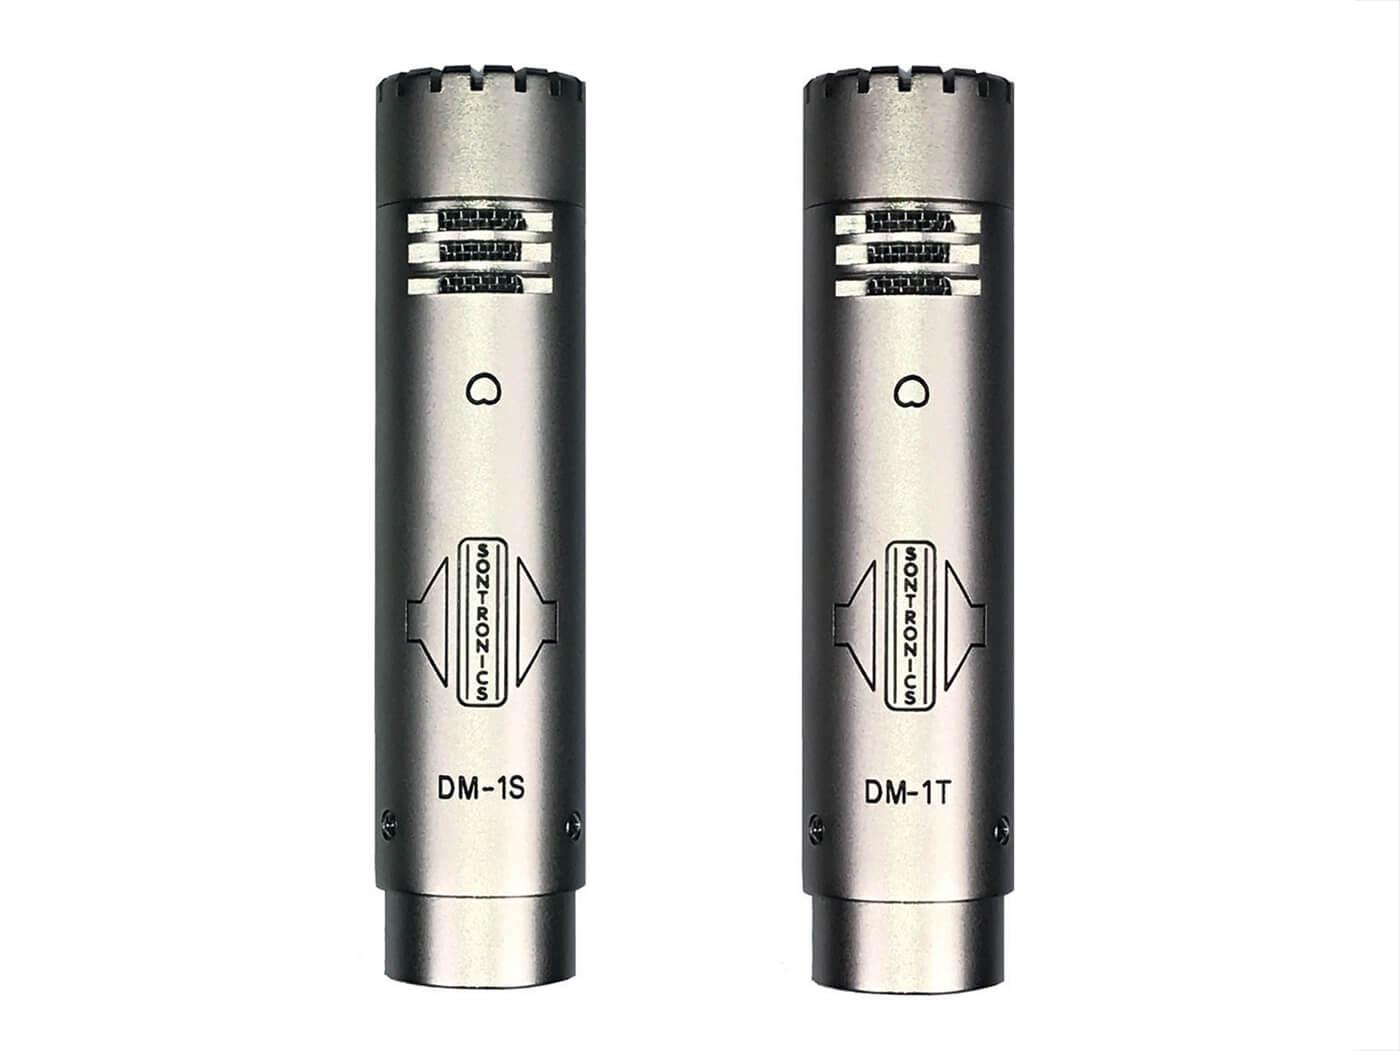 Sontronics DM-1S and DM-1T